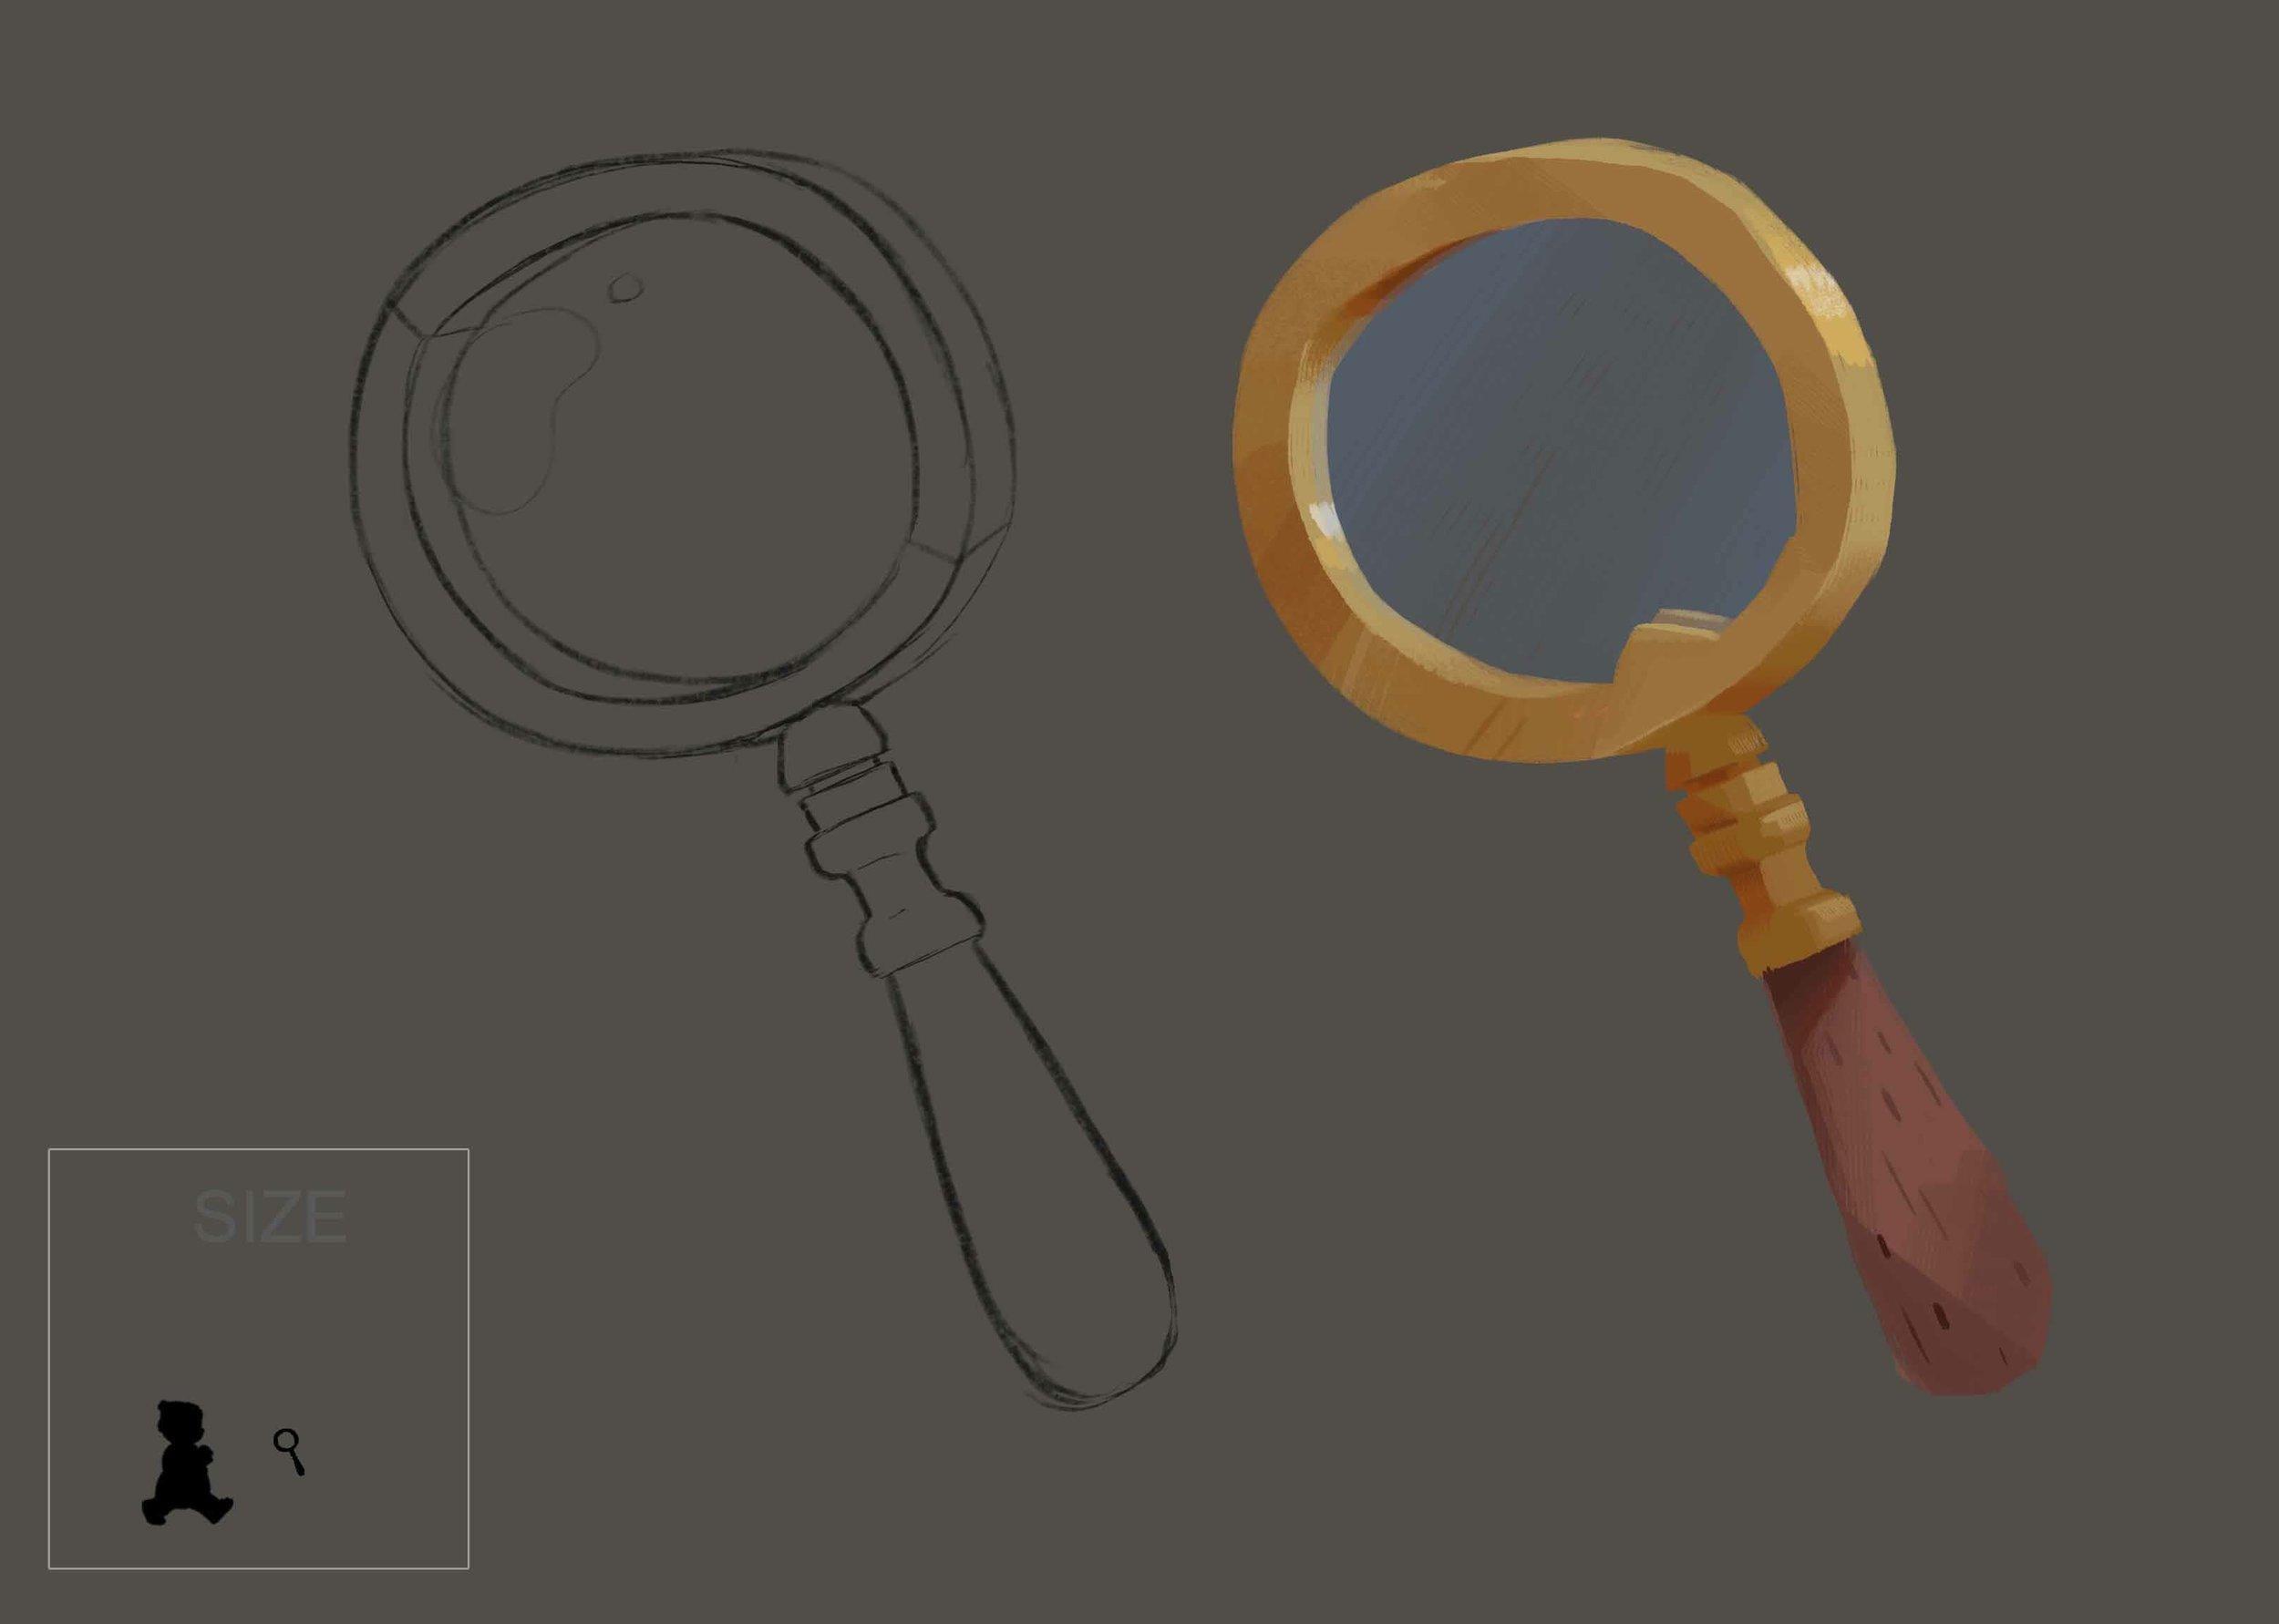 PROPS_Magnifier_DESIGN_KUDDELMUDDELMagnifyingGlass.v000_thumb.jpg